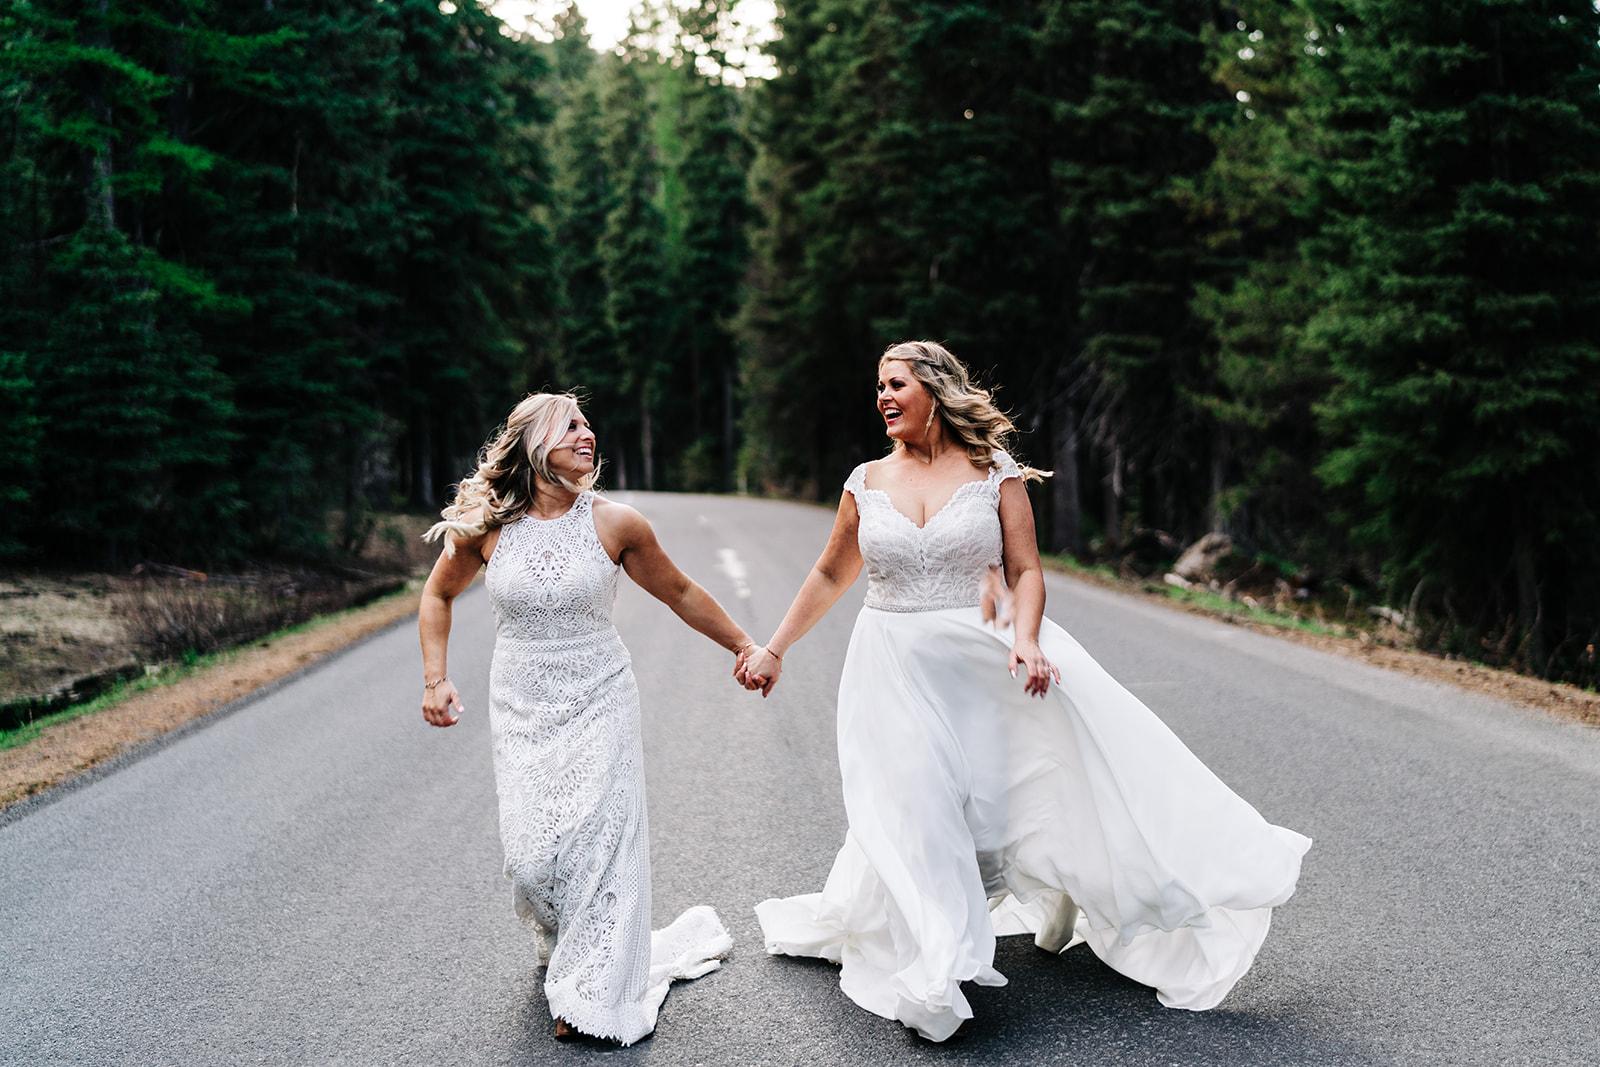 falissa_heather_wedding-561.jpg